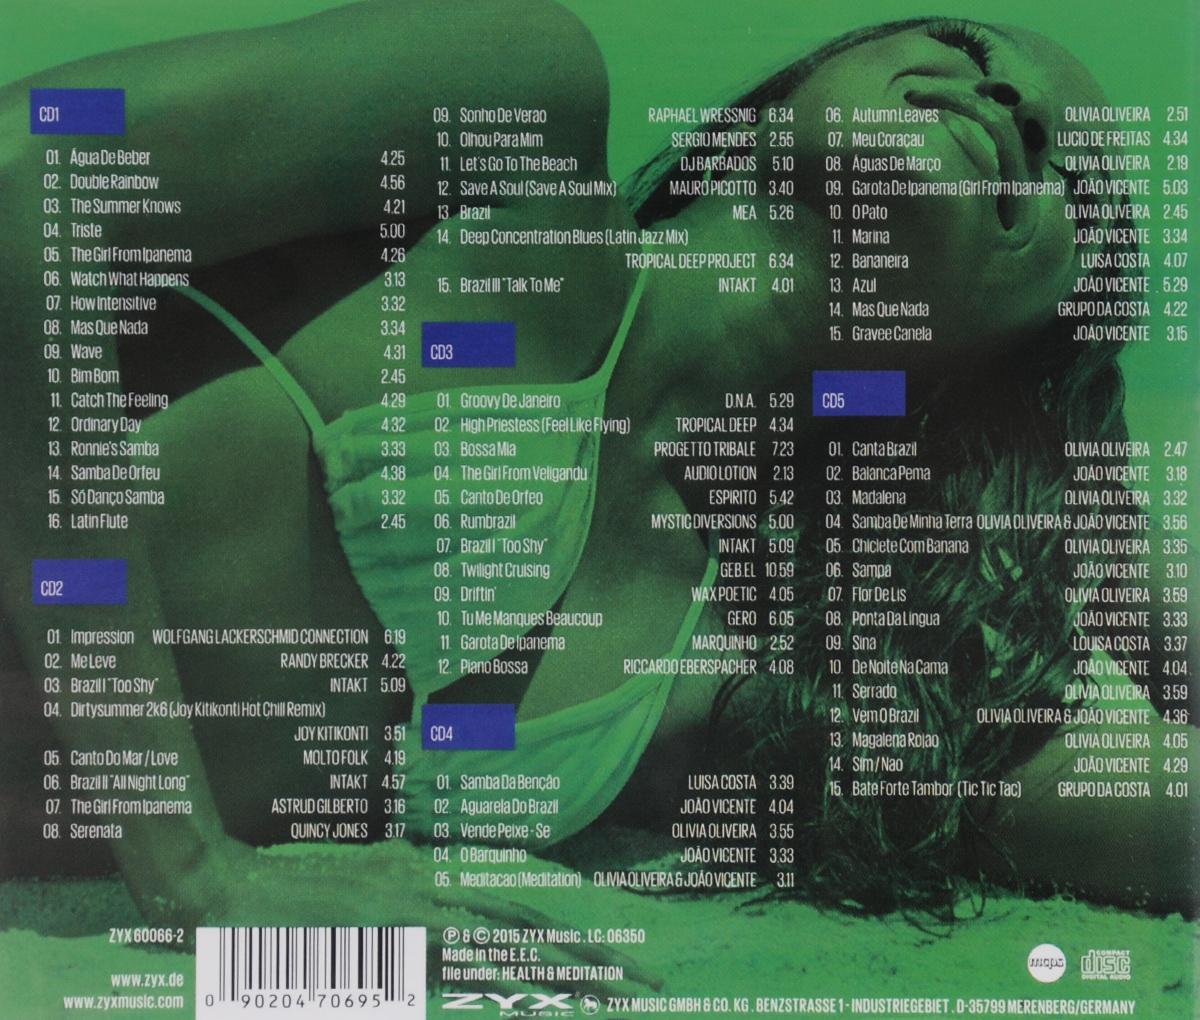 "Brasil Lounge (5 CD). ""Yellow Green And More"",Рэнди Бреккер,Intakt,Джой Китиконти,""Molto Folk"",Аструд Жильберто,Квинси Джонс,Dj Barbados,""D.N.A."",""Tropical Deep"",""Progetto Tribale"",""Audio Lotion"",""Espirito"",""Mystic Diversions"",Луиса Коста,Джо Висент,Оливия Оливейра,Лусио де Фрейтас,""Grupo Da Costa"""